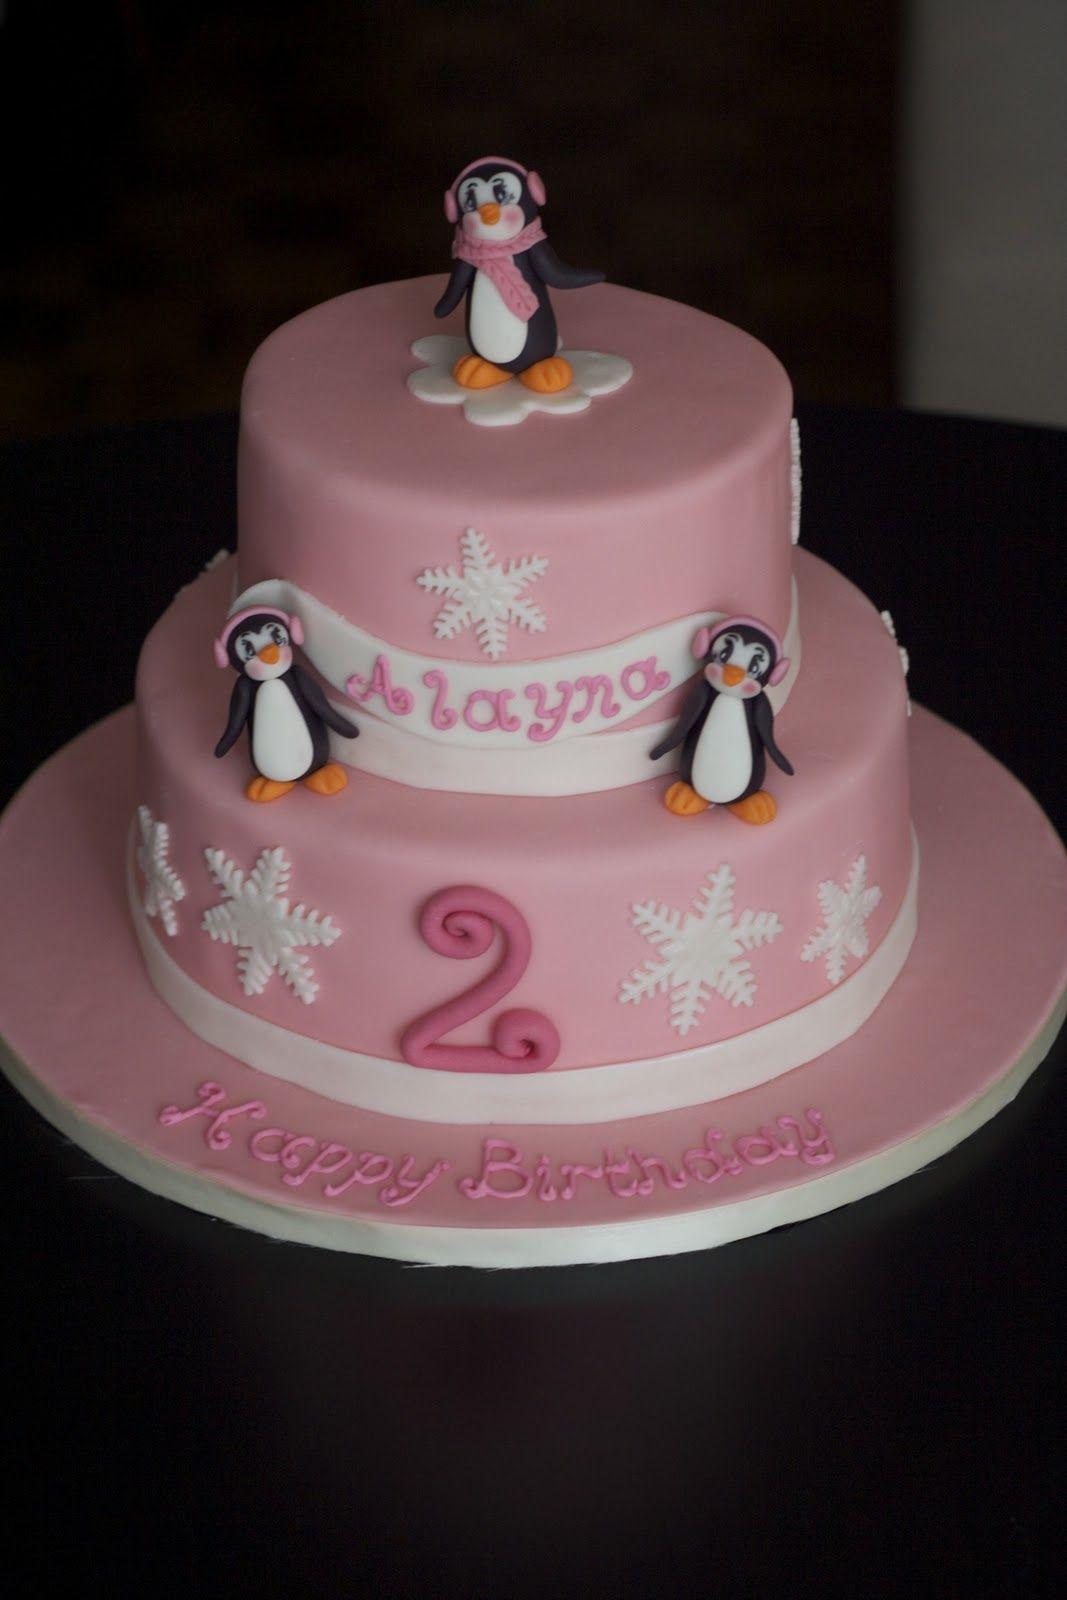 17-year-old-birthday-party-ideas-8 | cakes | pinterest | birthday